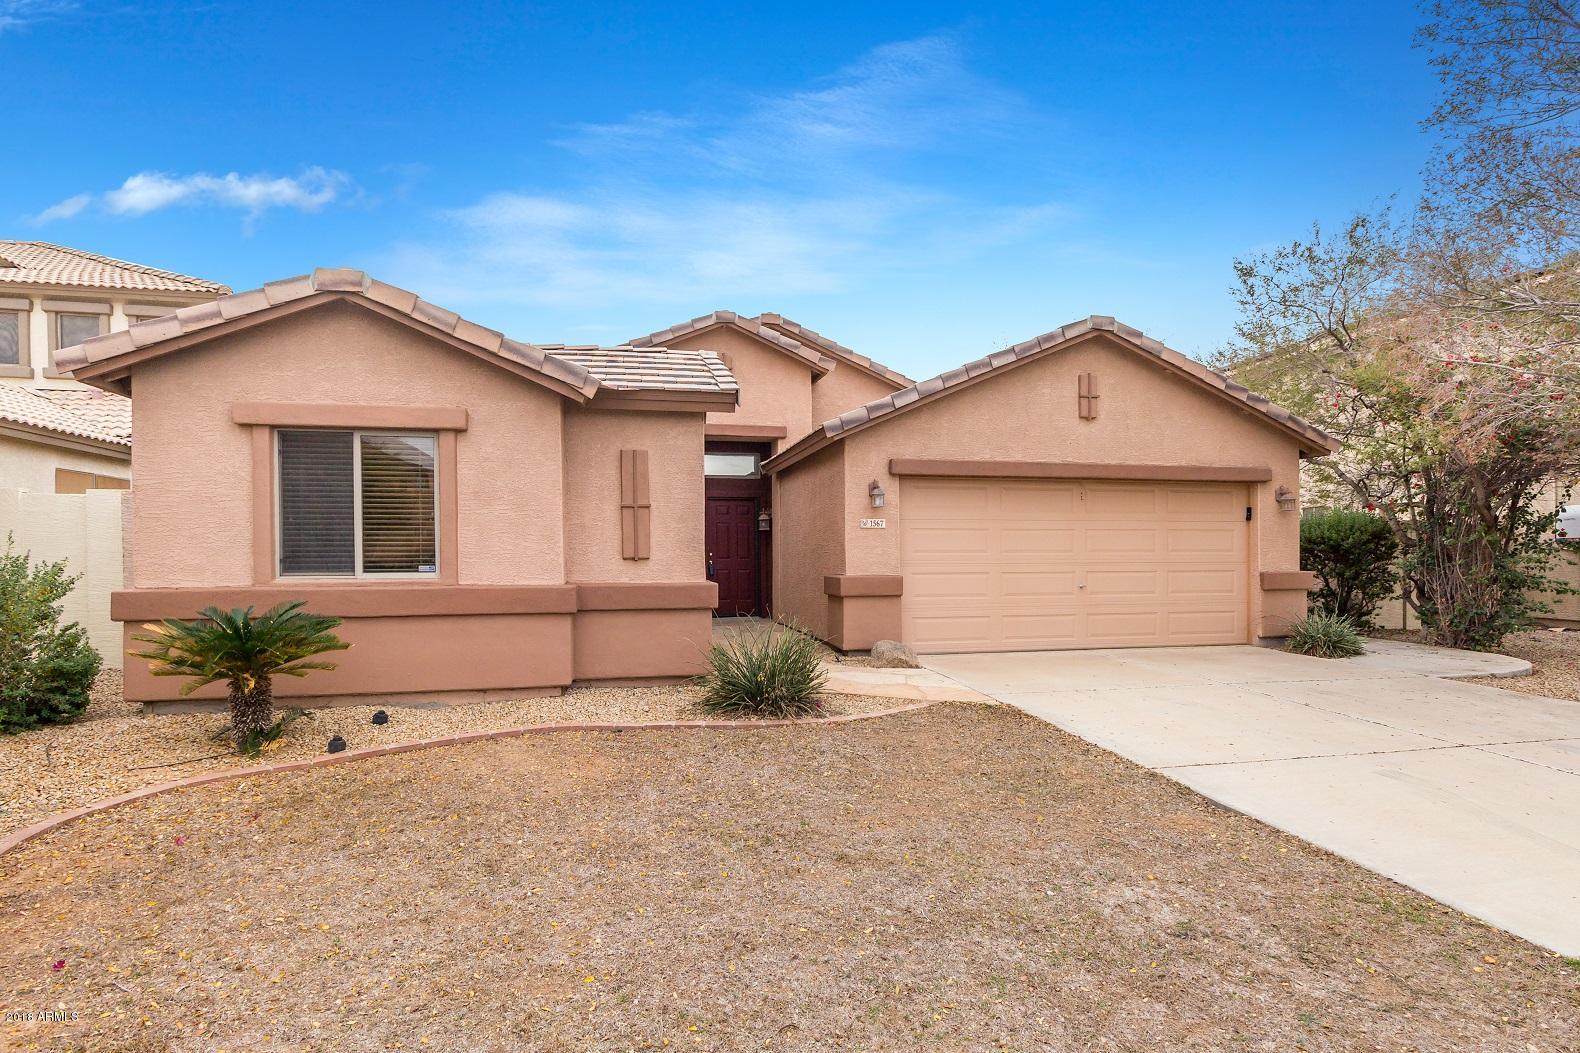 MLS 5856625 1567 E 11TH Court, Casa Grande, AZ 85122 Casa Grande AZ REO Bank Owned Foreclosure